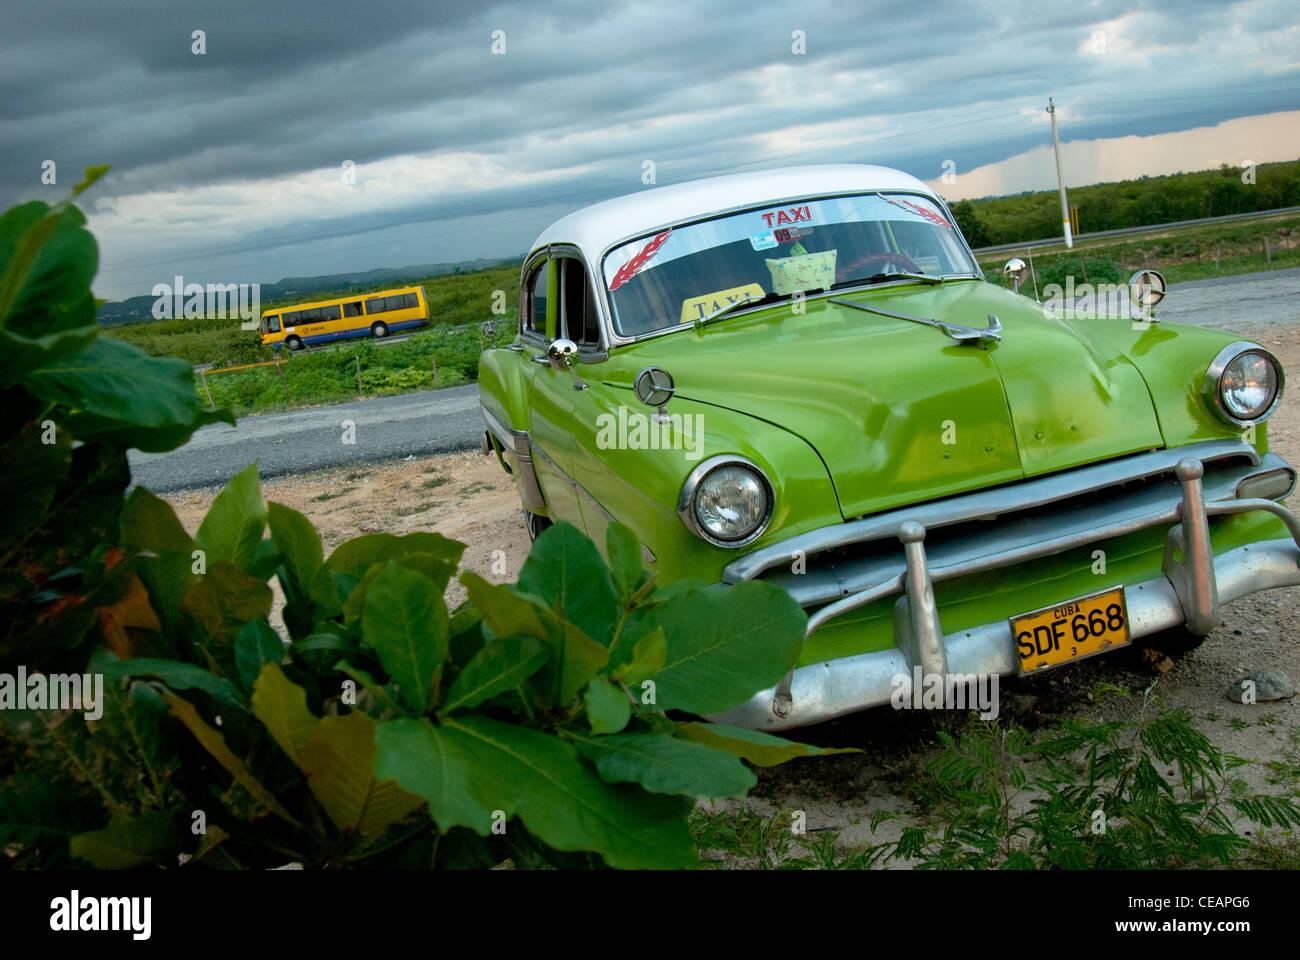 Cuba Beach Car Stock Photos & Cuba Beach Car Stock Images - Alamy